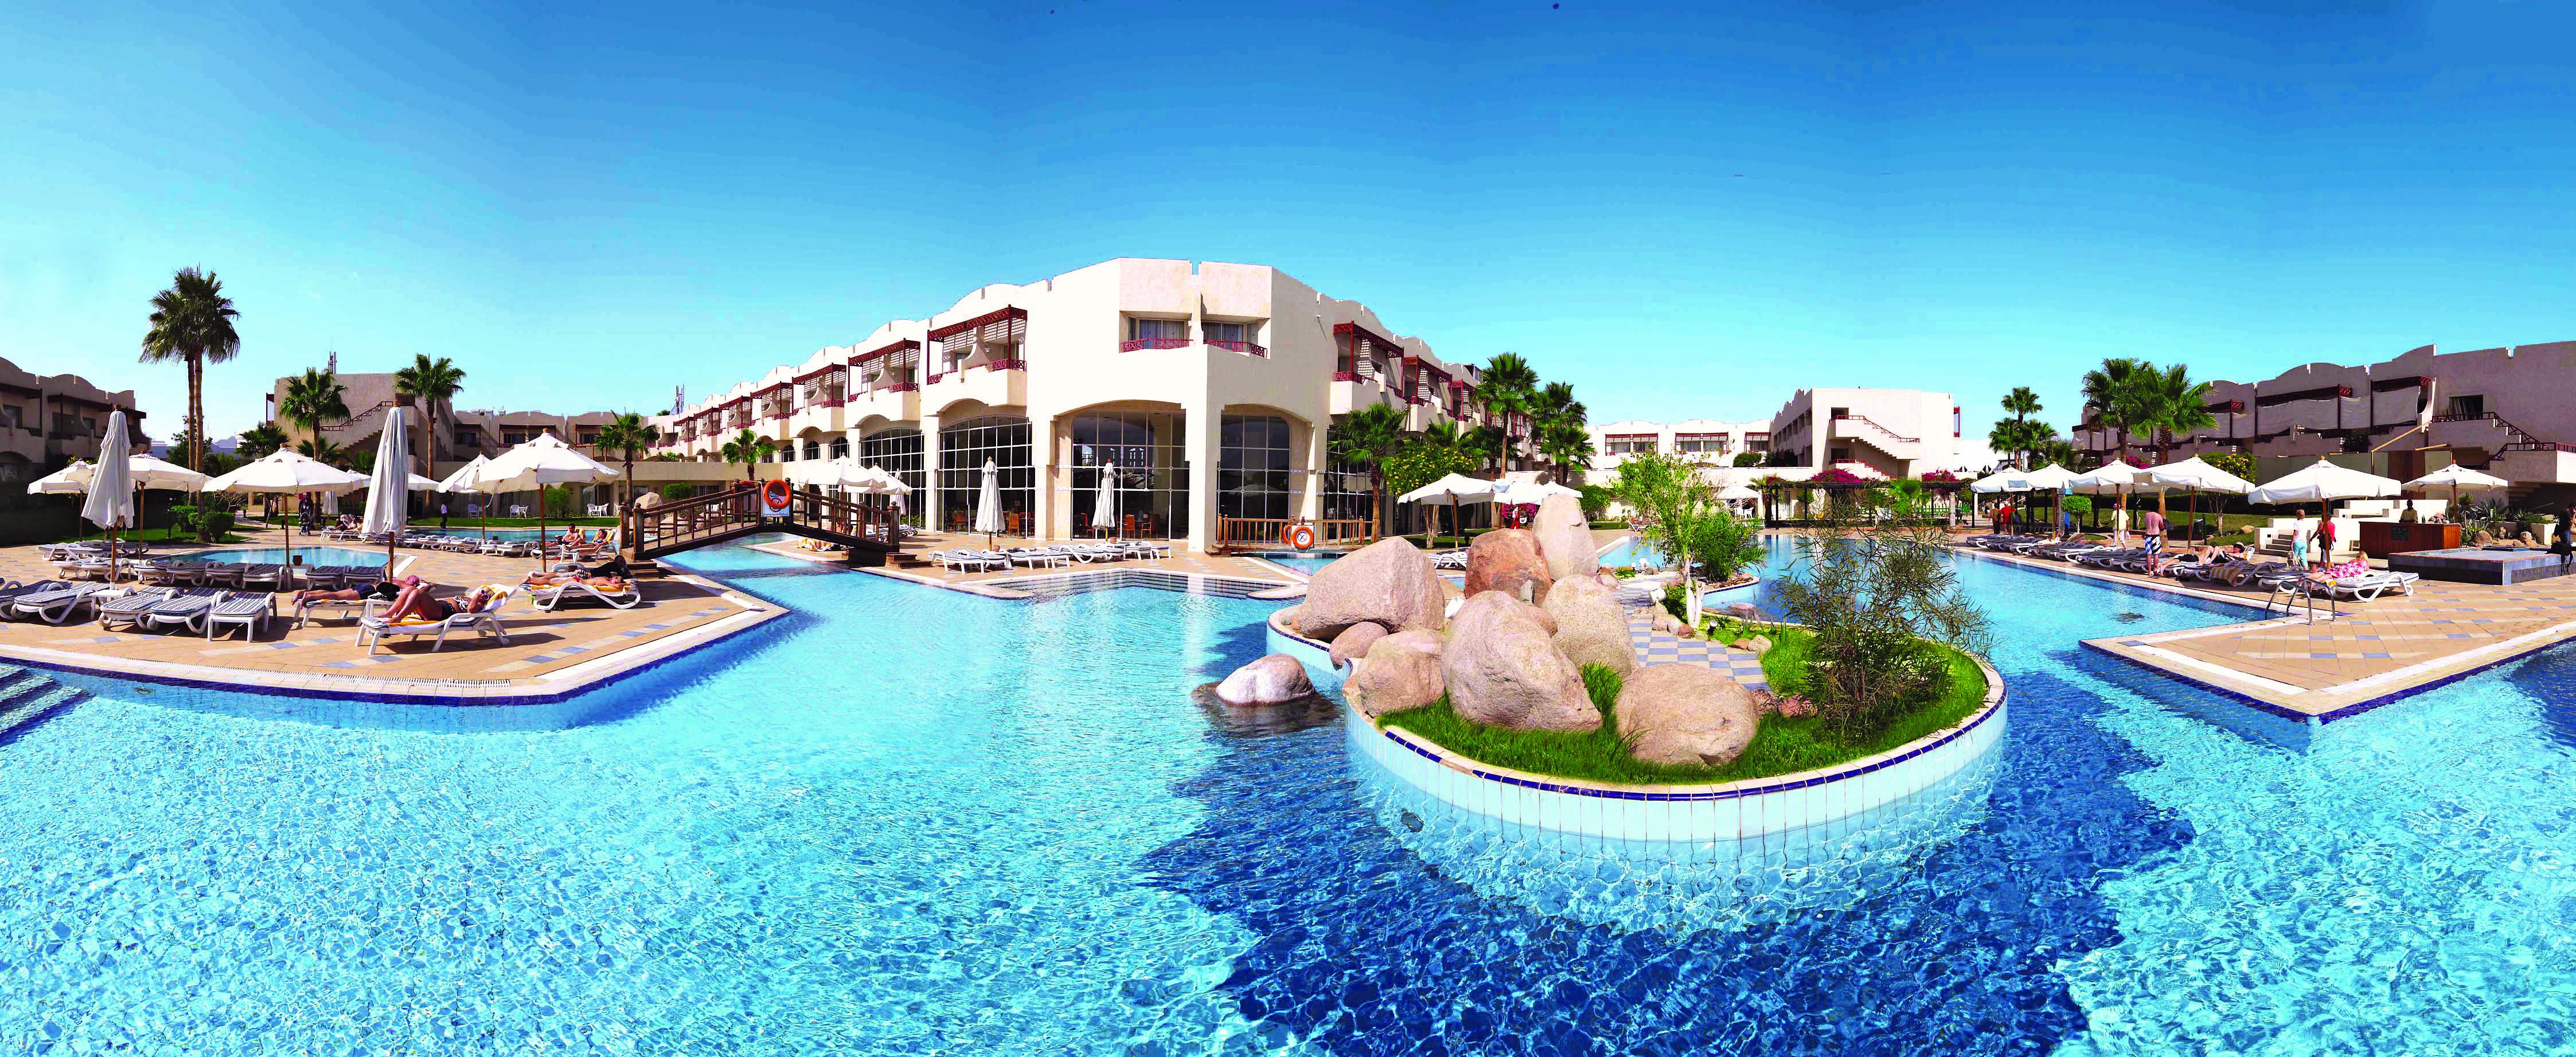 SHARM EL SHEIKH MARRIOTT RED SEA RESORT BEACH SIDE | Sharm el Sheikh